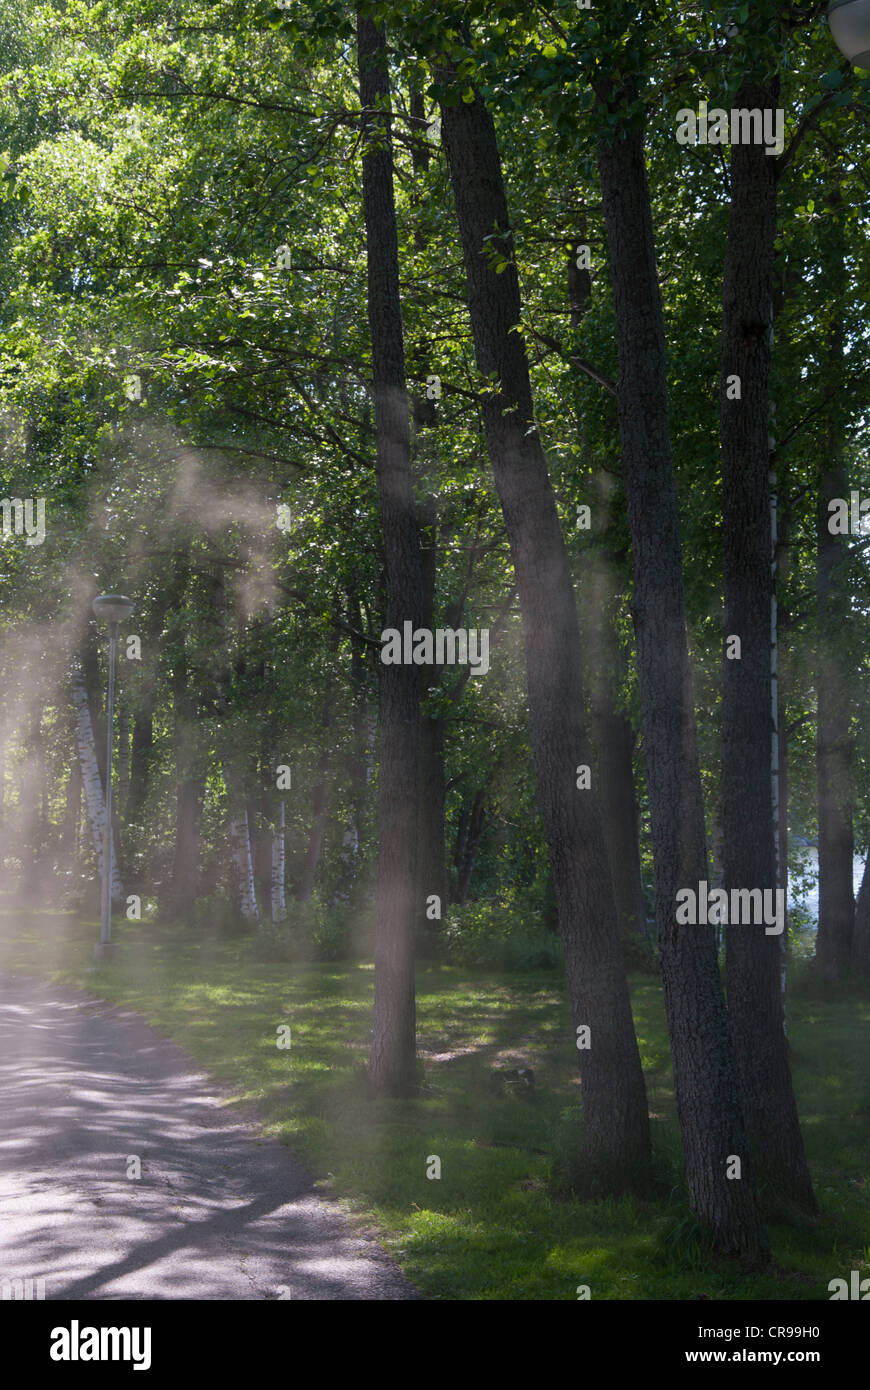 Smoke on the path - Stock Image